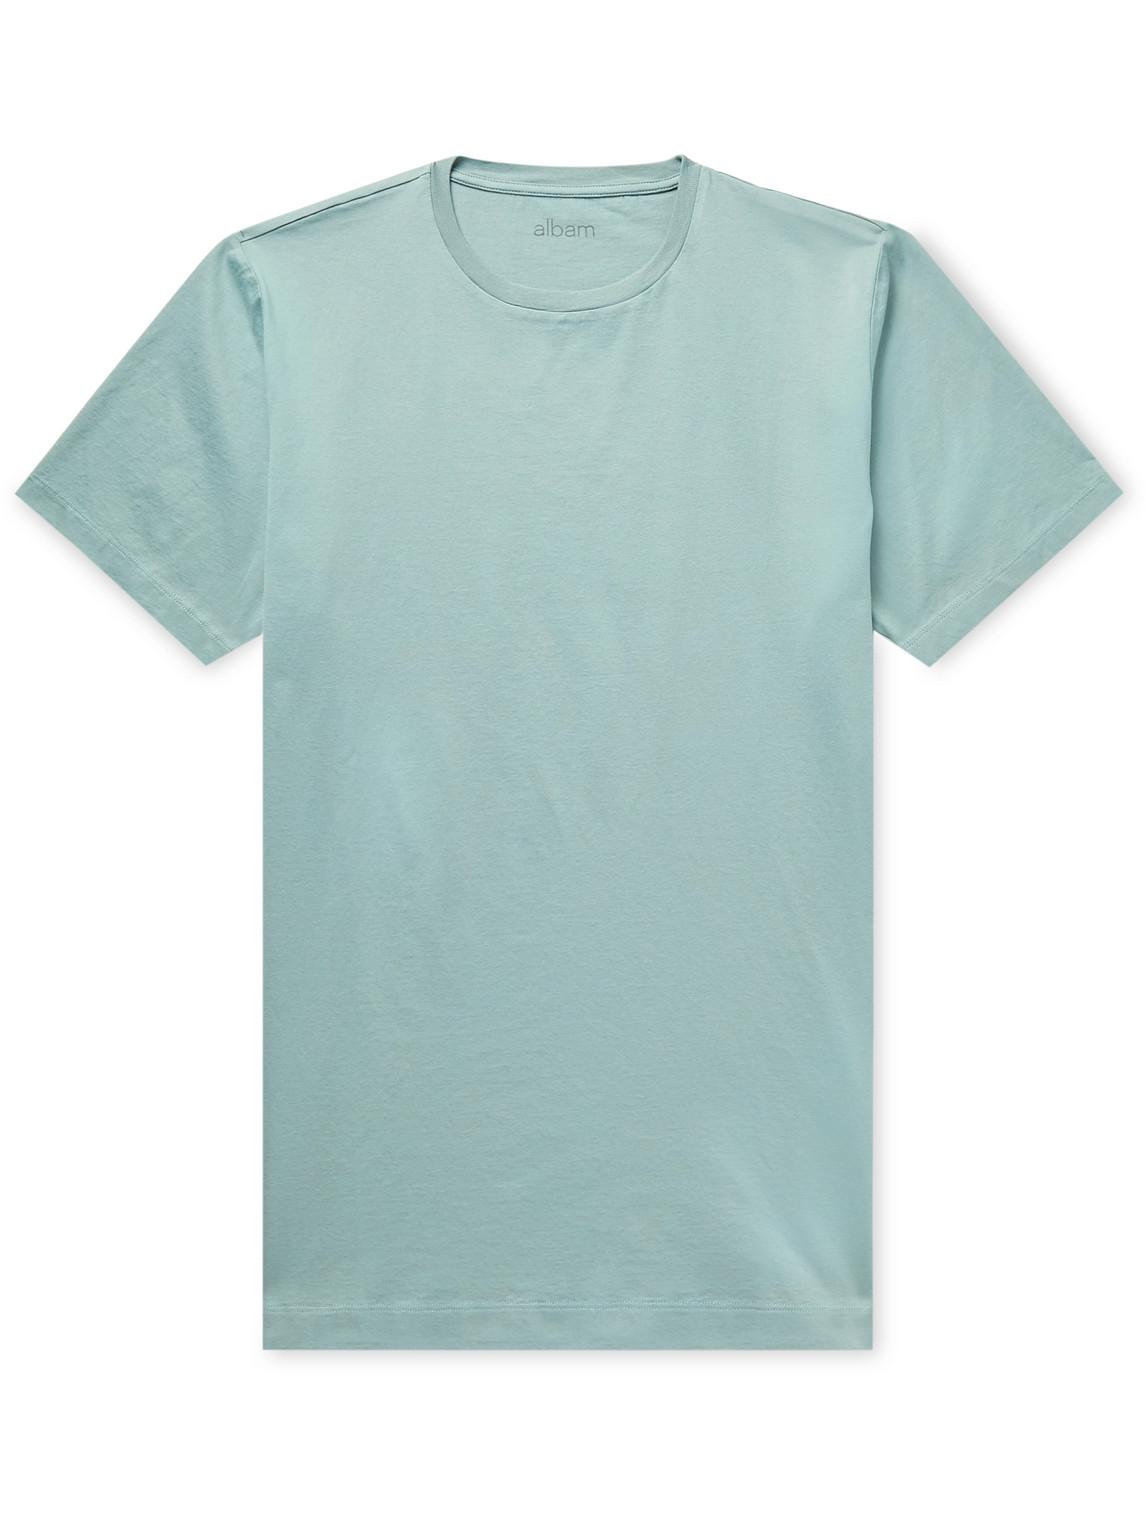 Albam Cotton-jersey T-shirt In Green